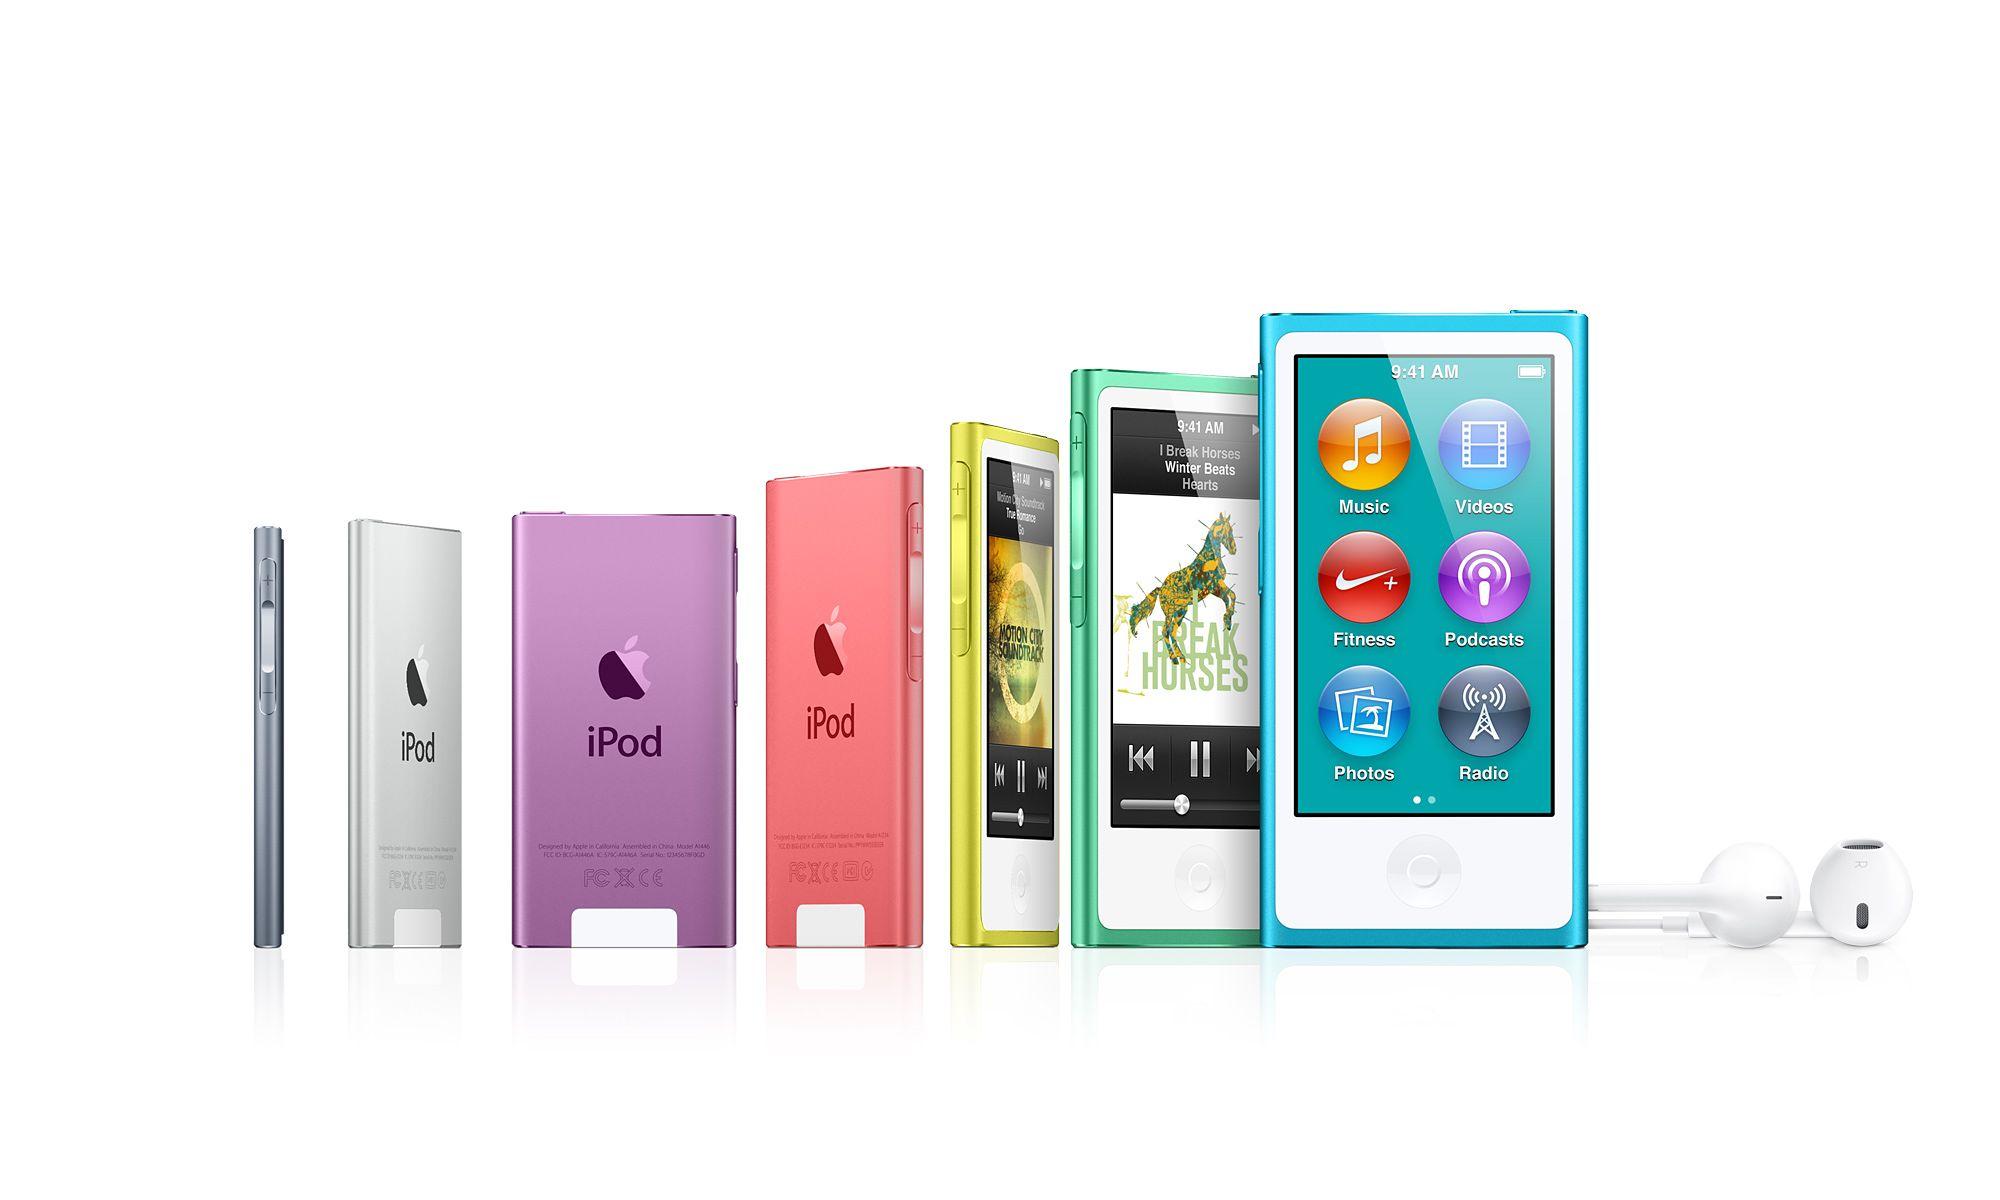 le nouvel ipod nano est disponible en pr commande info idevice. Black Bedroom Furniture Sets. Home Design Ideas